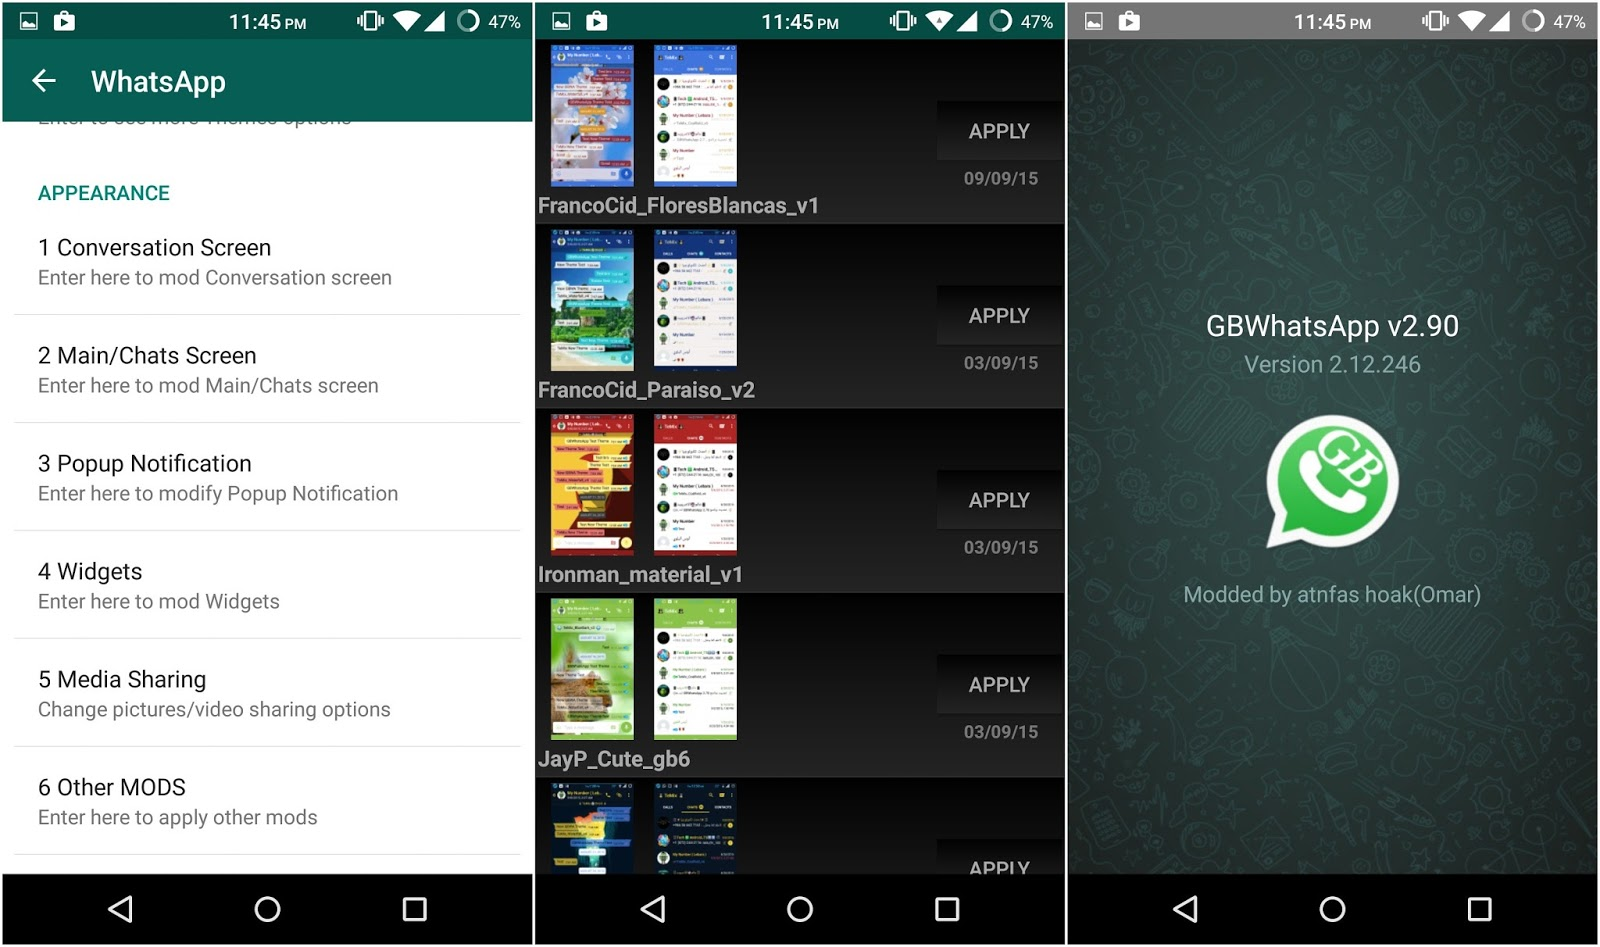 gb whats app latest apk